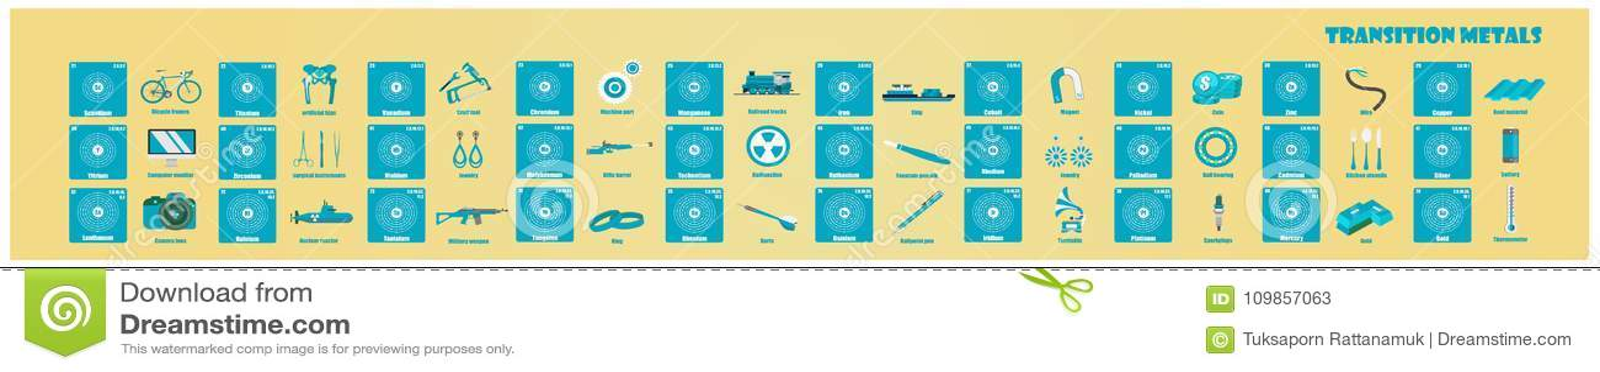 Tabla peridica de metales de transicin del elemento ilustracin download comp urtaz Images